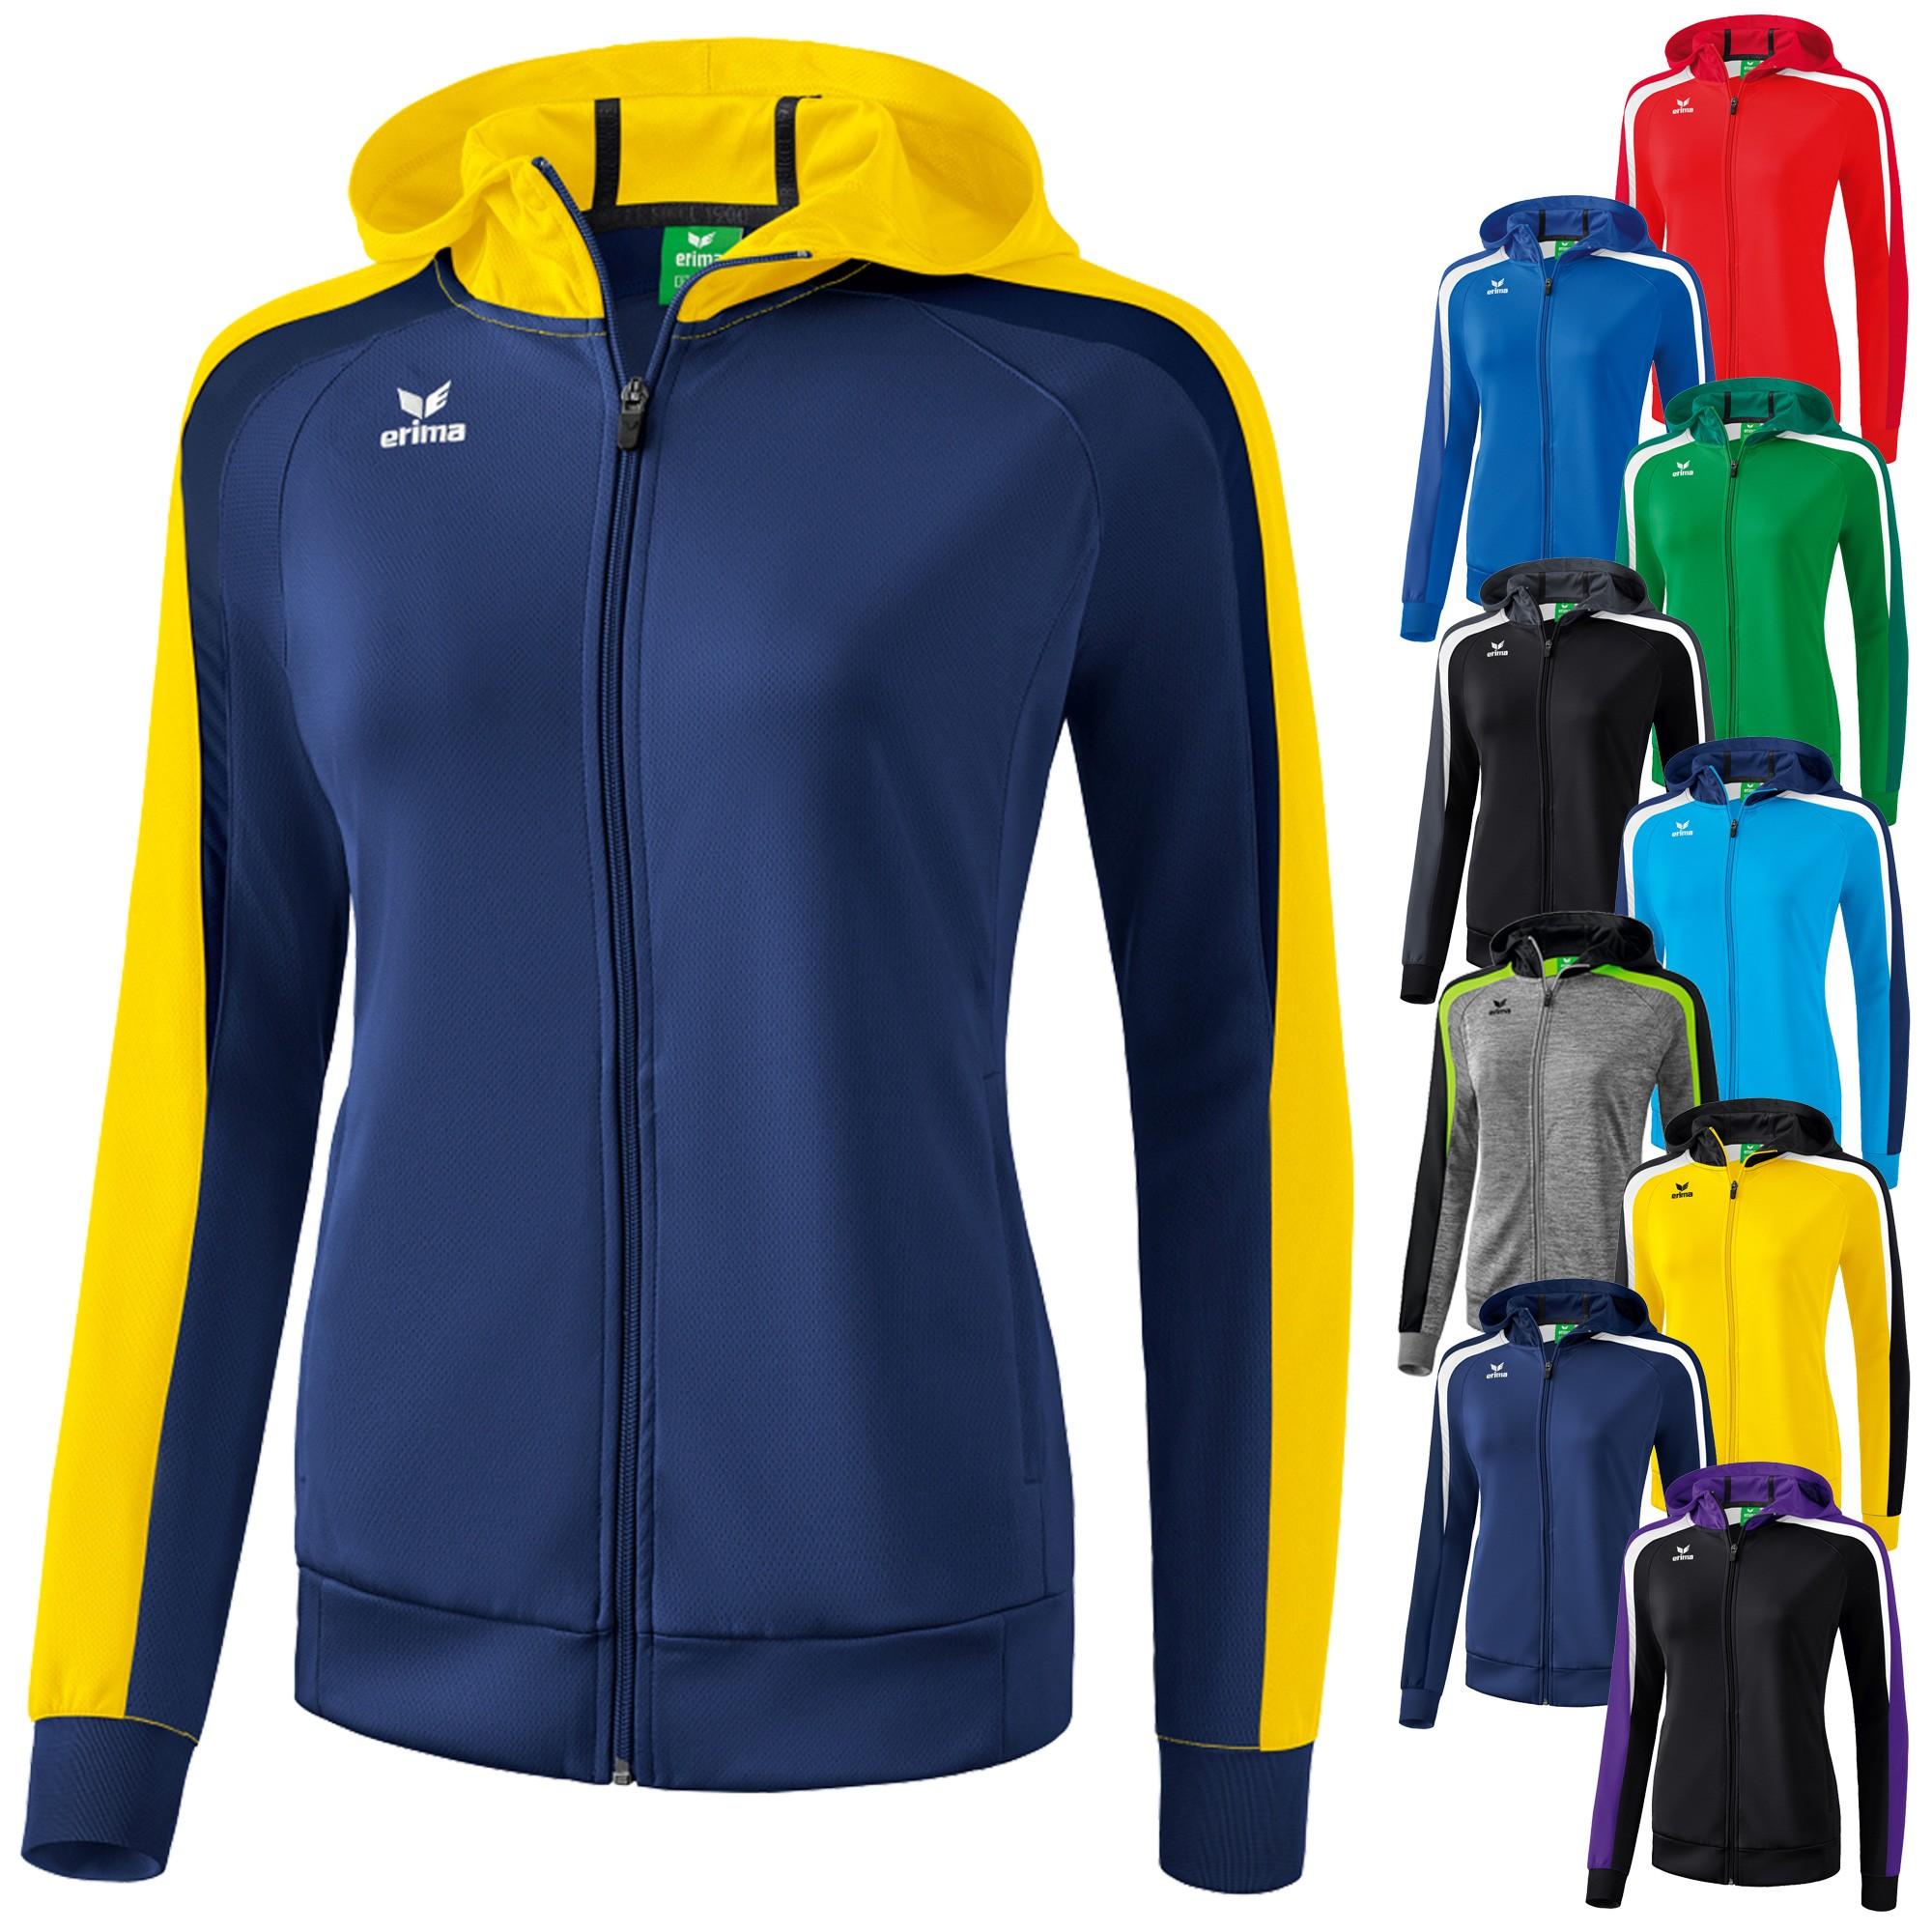 Veste d'entraînement avec capuche Liga 2.0 Femme